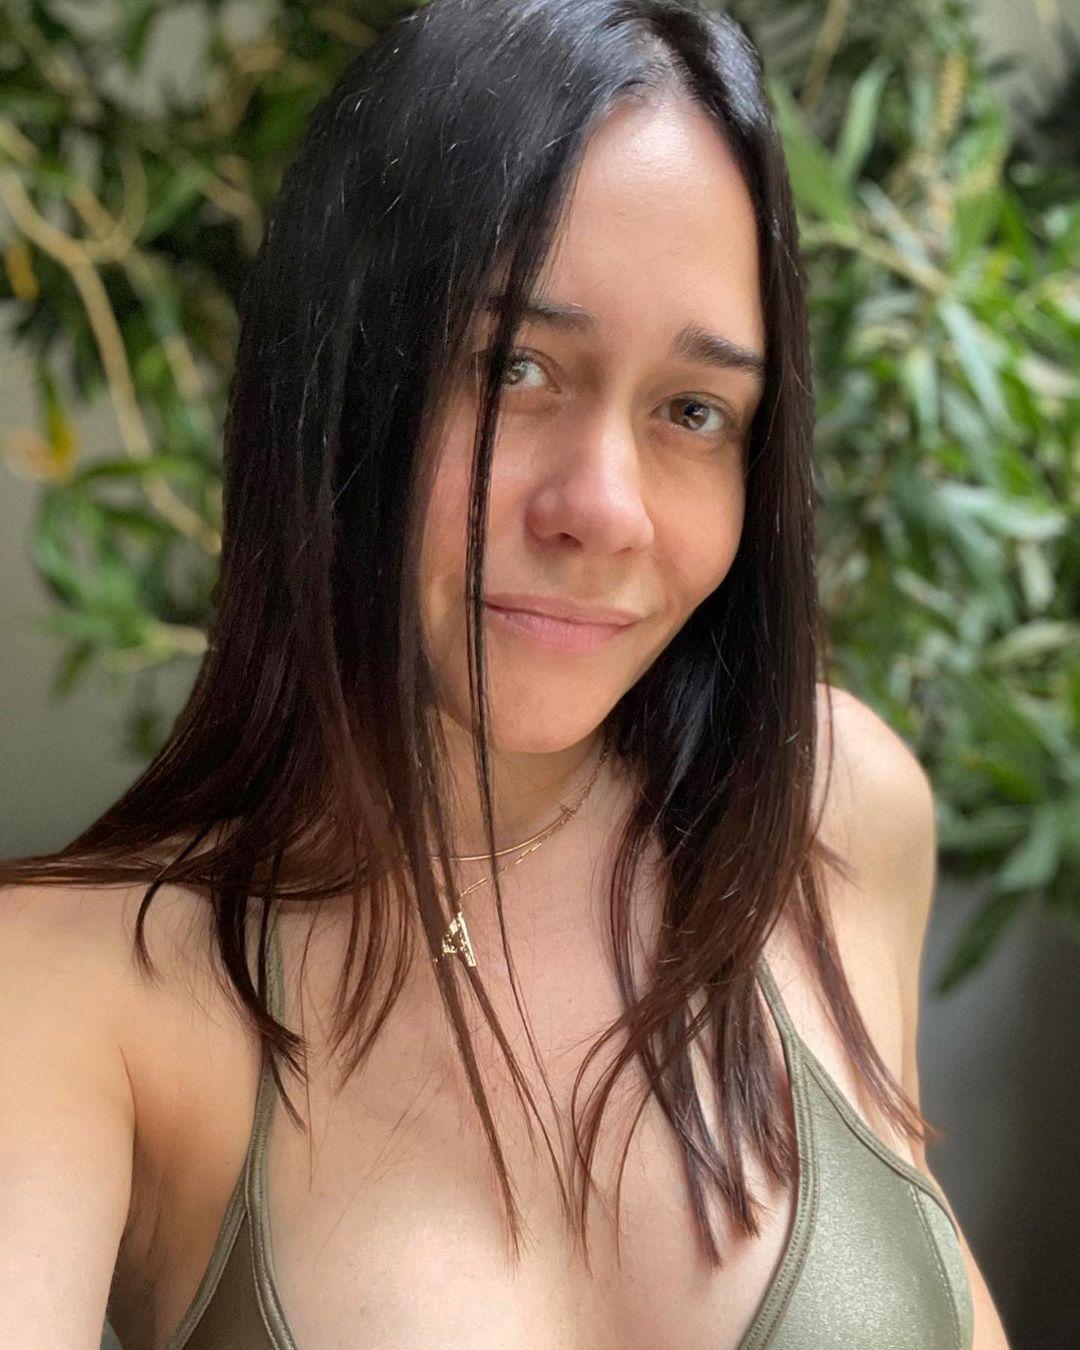 Alessandra Negrini mostrou treino e foi elogiada na web